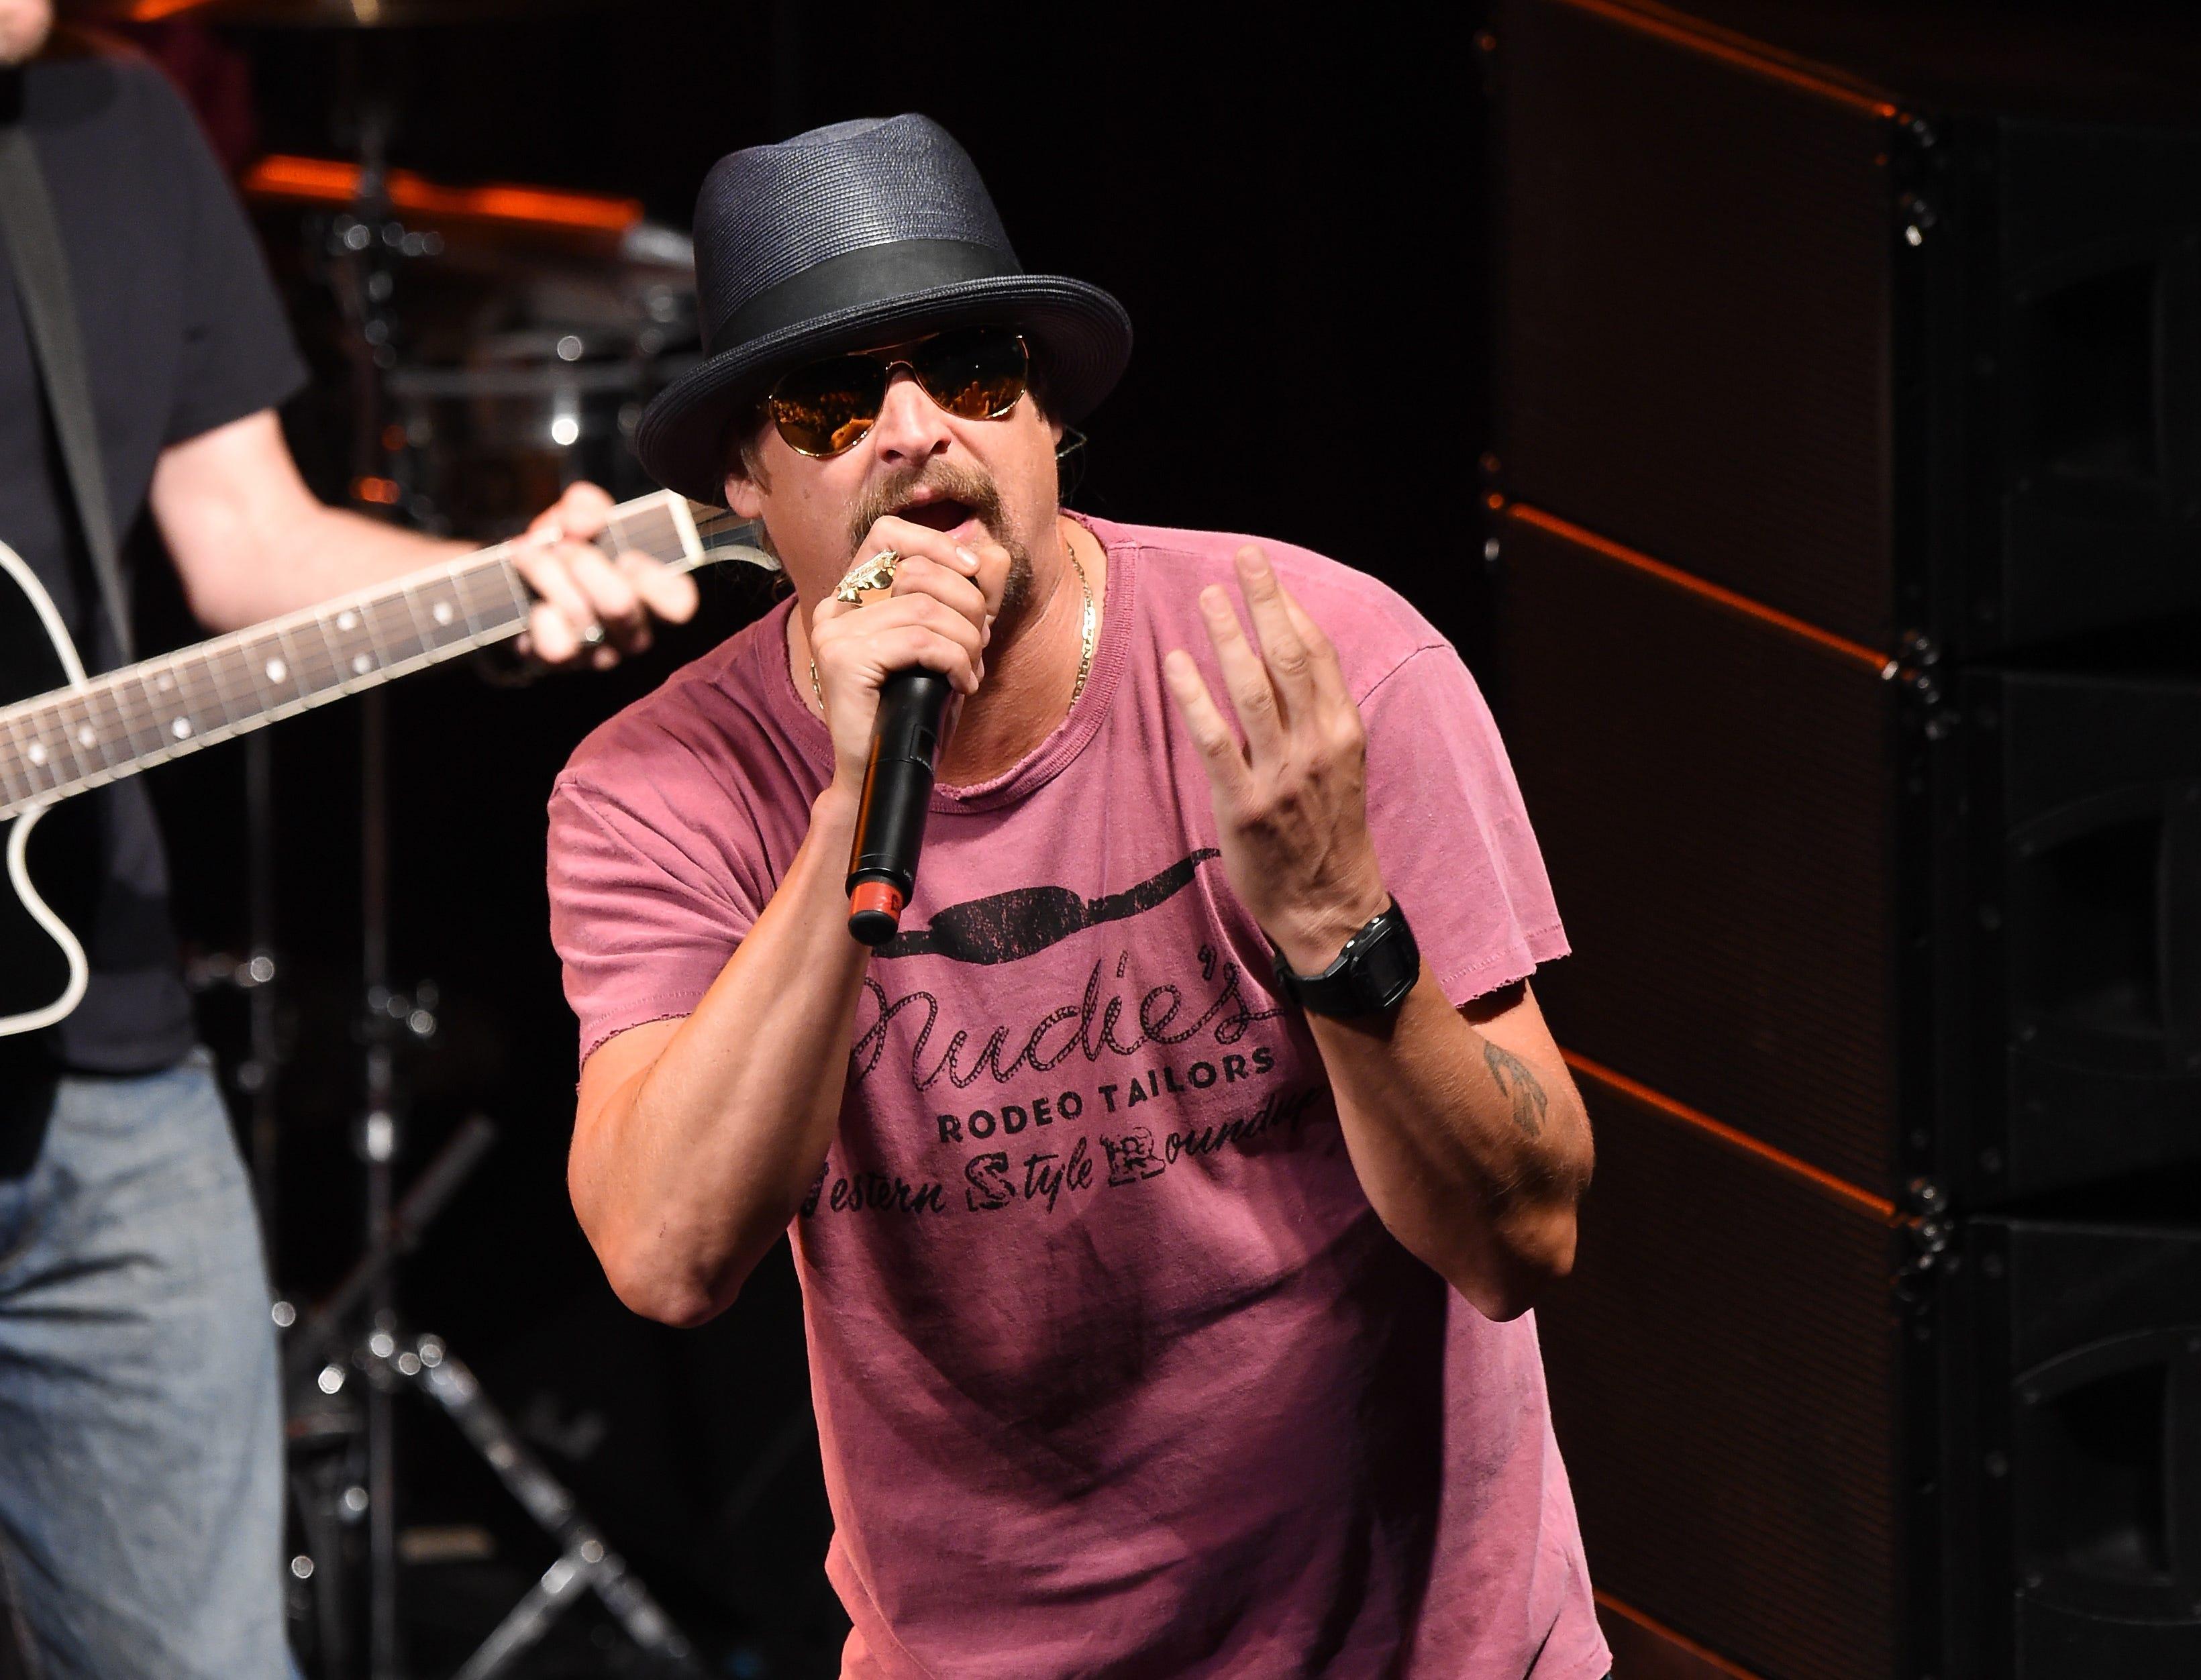 kid rock first kisskid rock cafe, kid rock bawitdaba, kid rock all summer long, kid rock cowboy, kid rock cafe тц хорошо, kid rock магазин, kid rock american bad, kid rock cafe отзывы, kid rock bawitdaba скачать, kid rock first kiss, kid rock wiki, kid rock скачать, kid rock cowboy перевод, kid rock кафе, kid rock слушать, kid rock so hott скачать, kid rock born free, kid rock скалодром, kid rock live, kid rock – bawitdaba перевод